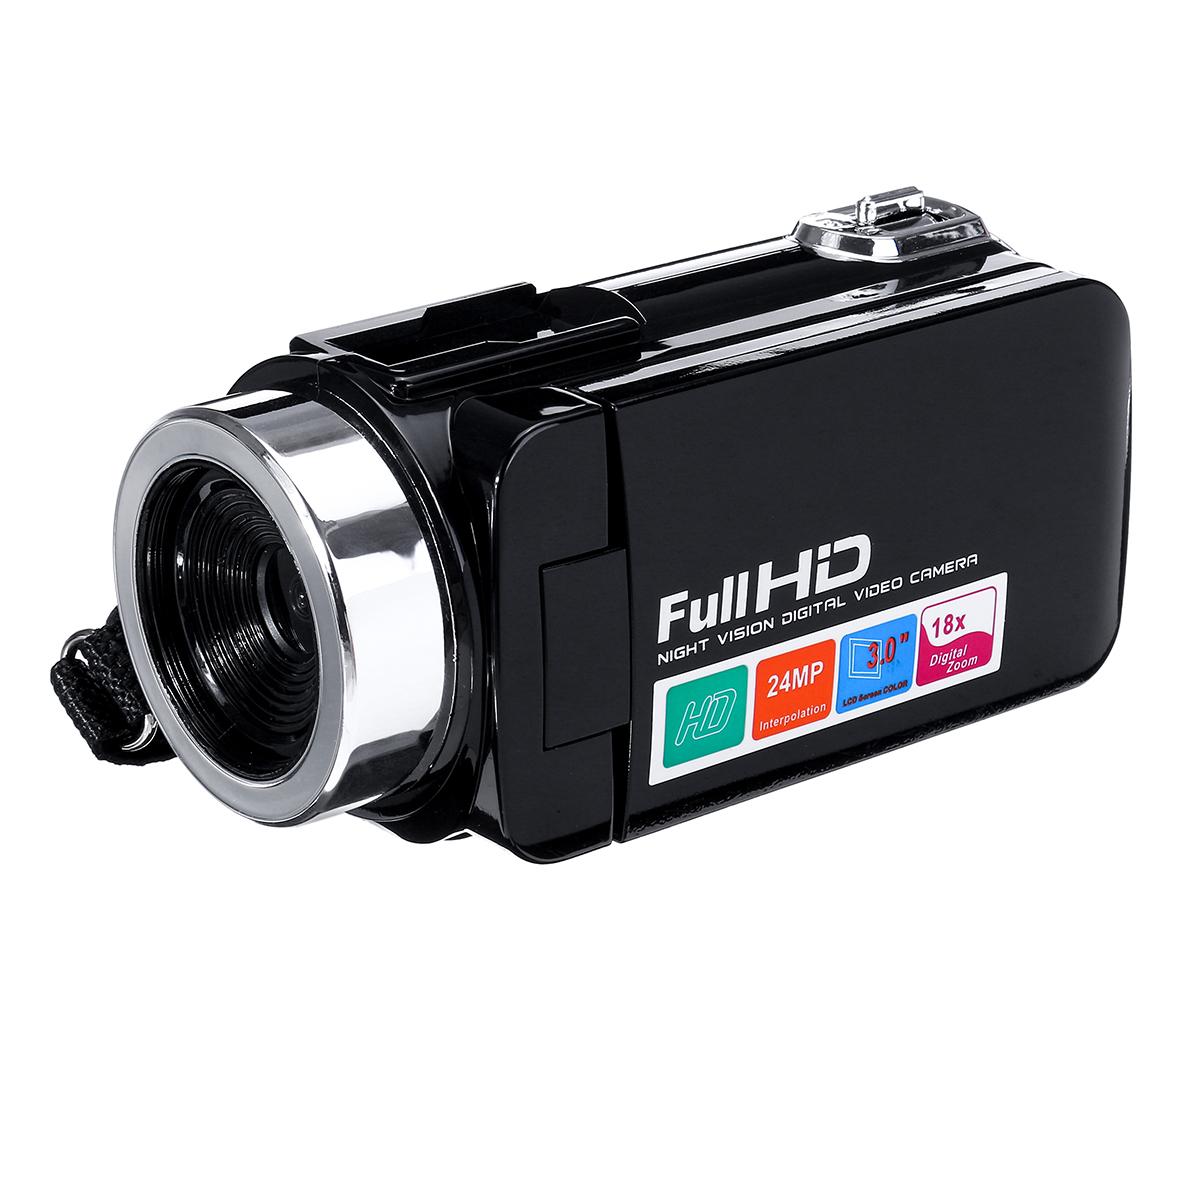 4K Full HD 1080P 24MP 18X Zoom 3 дюймов LCD Цифровая видеокамера Video DV камера 5.0MP CMOS Датчик для видеоблогов YouTu - фото 0b053773-f8e9-4eff-84c7-295c2739cd12.jpg